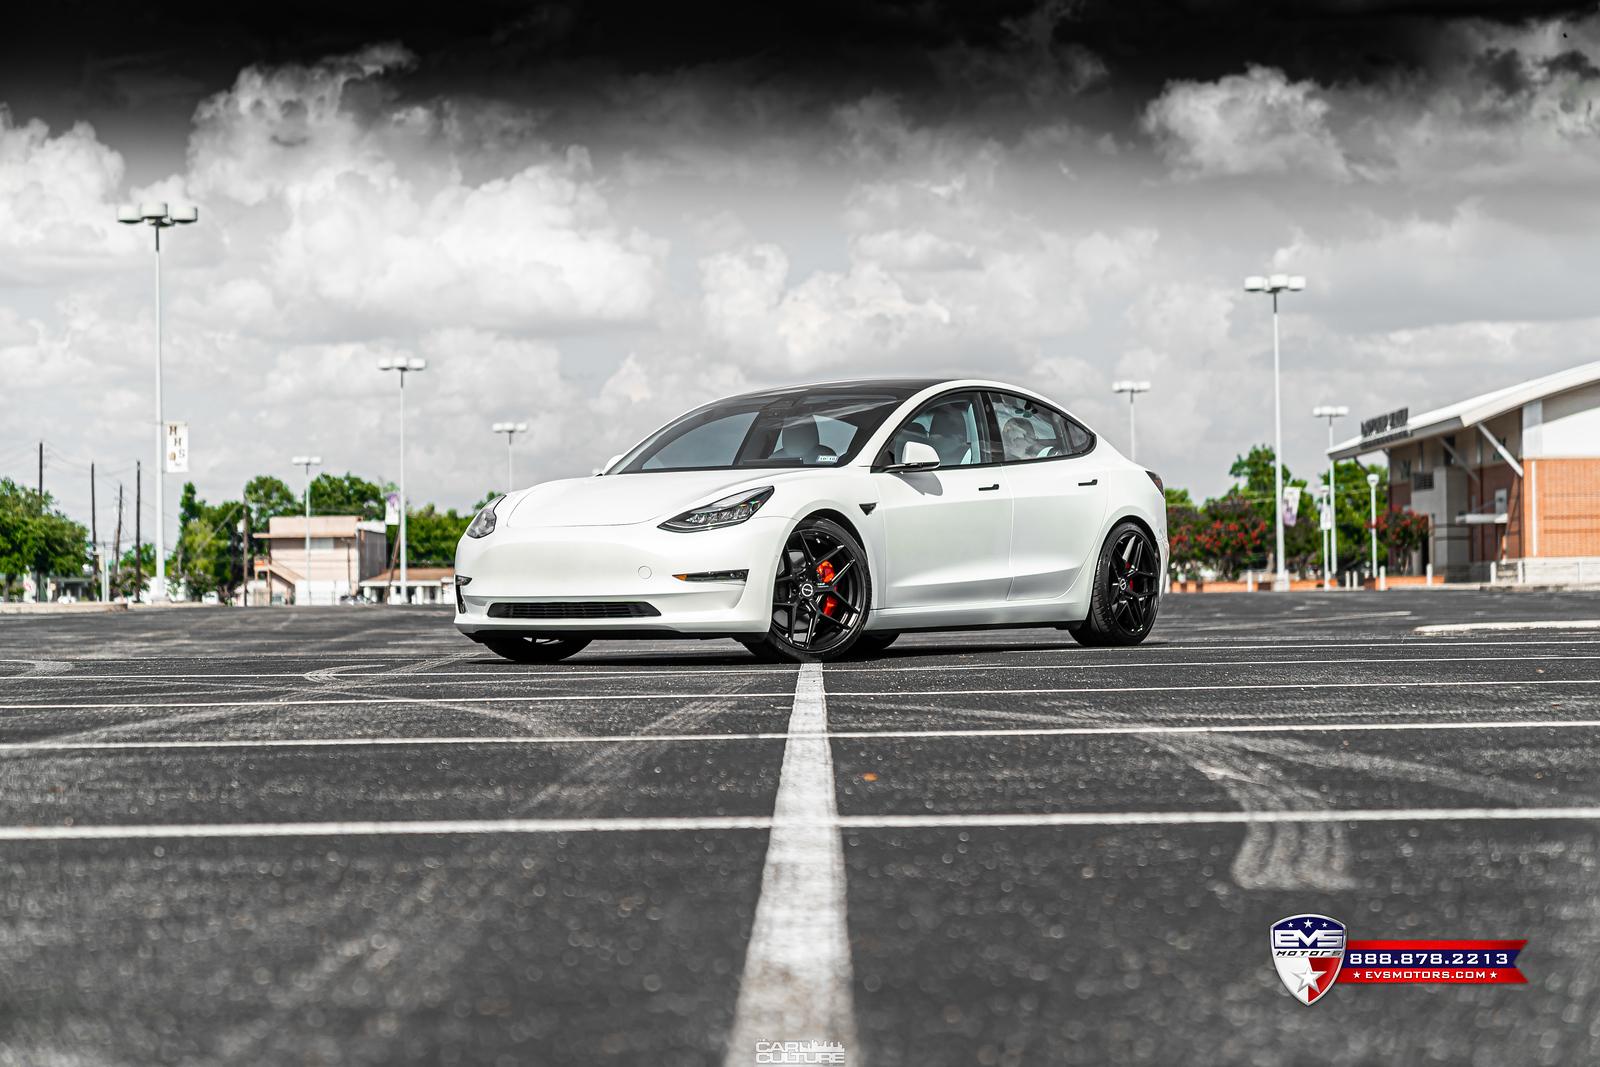 Tesla%20Model%203%20Performance%20on%20Brixton%20RF7-11-X3.jpg